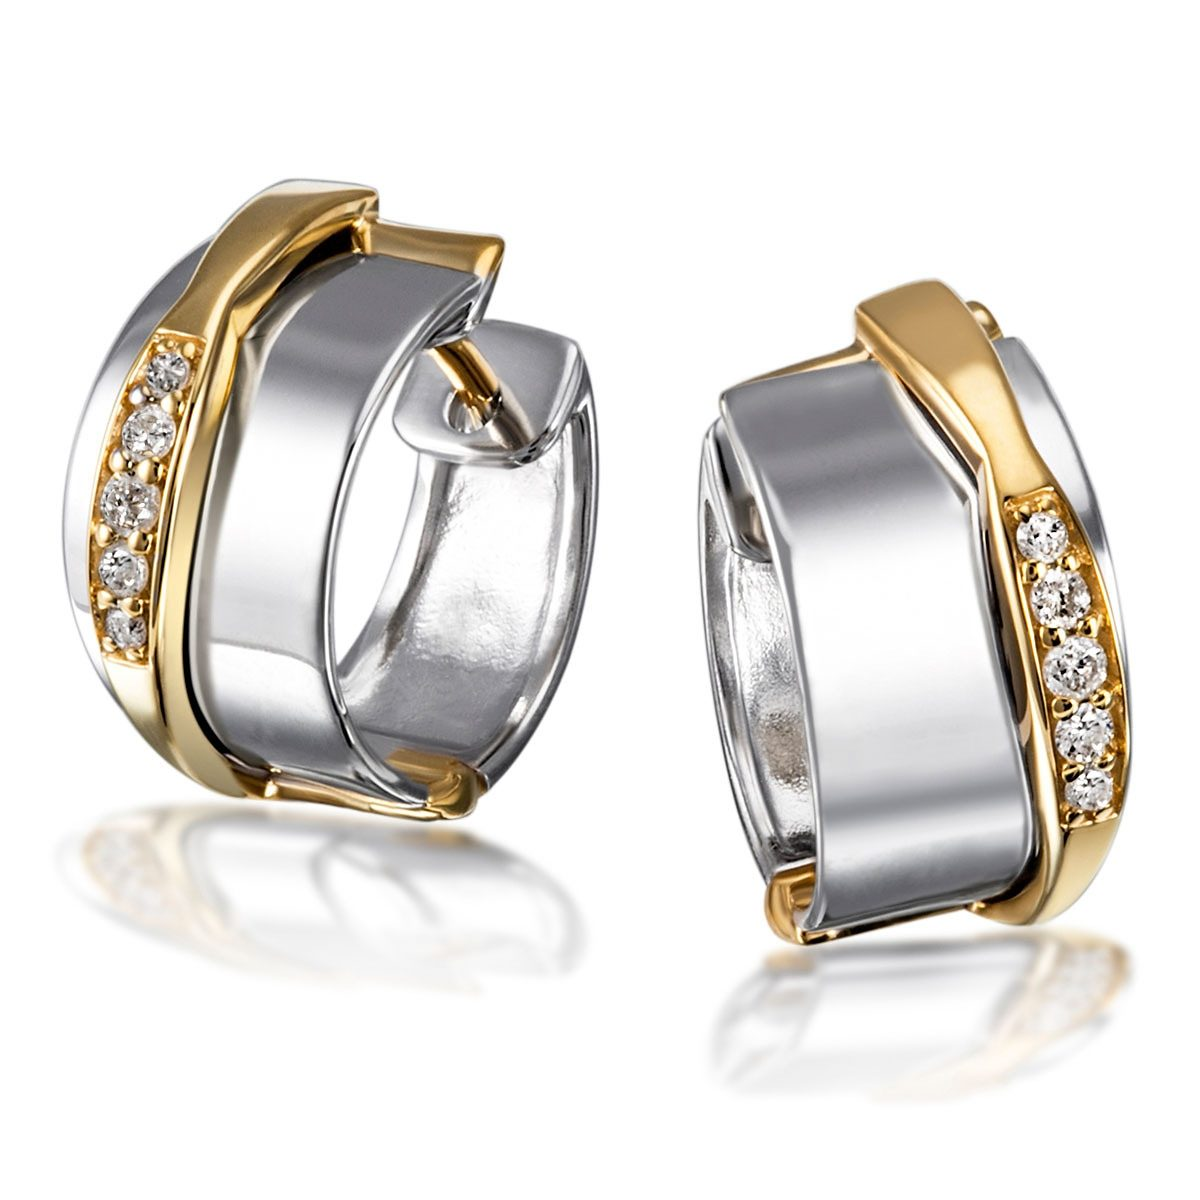 goldmaid Paar Creolen 925/- Sterlingsilber mit 585/- Gelbgoldanteil 10 Br